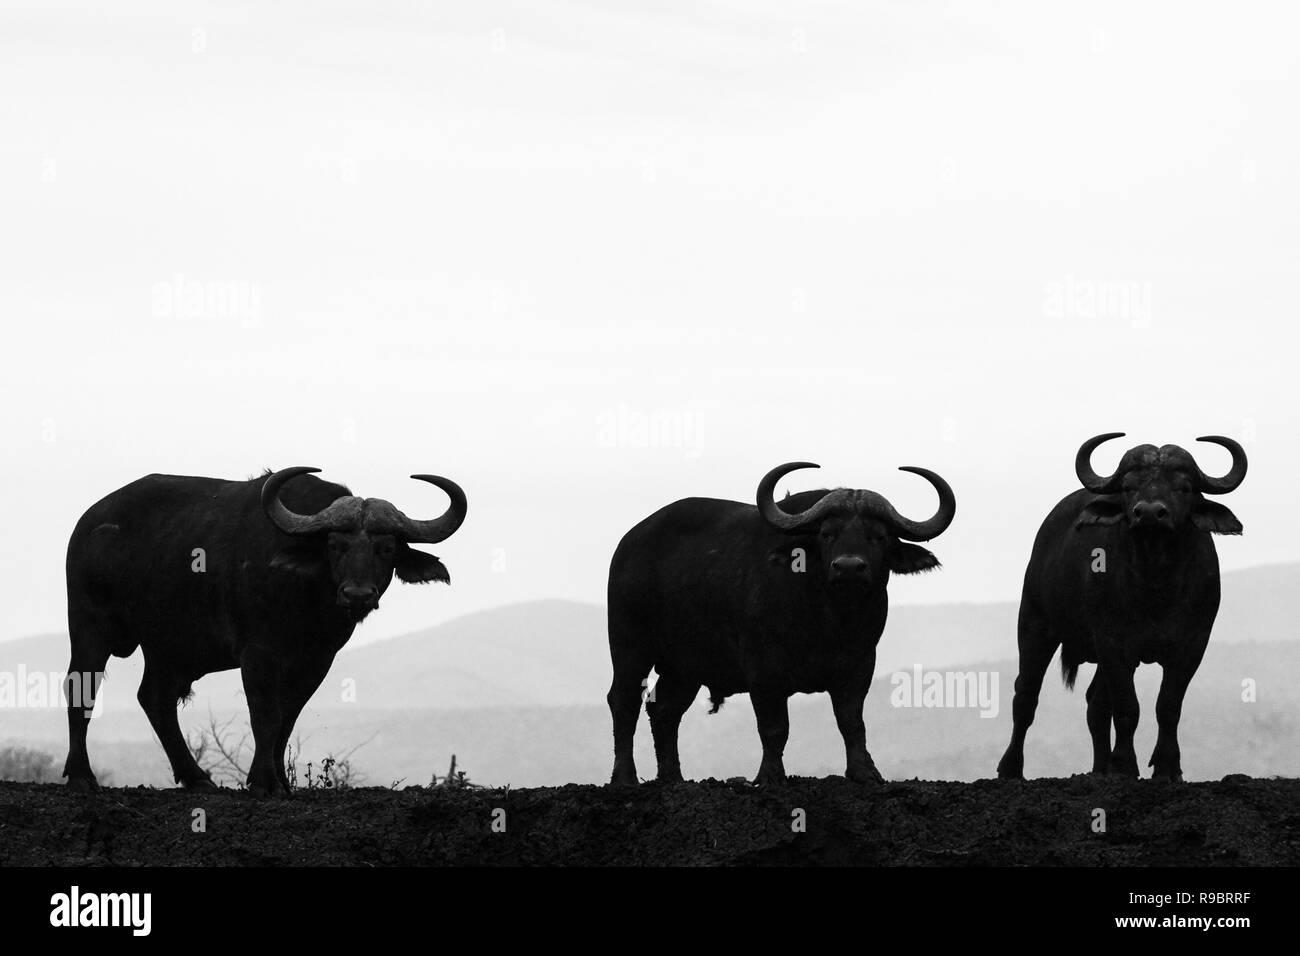 Cape buffalo (Syncerus caffer), Zimanga private game reserve, KwaZulu-Natal, South Africa Stock Photo